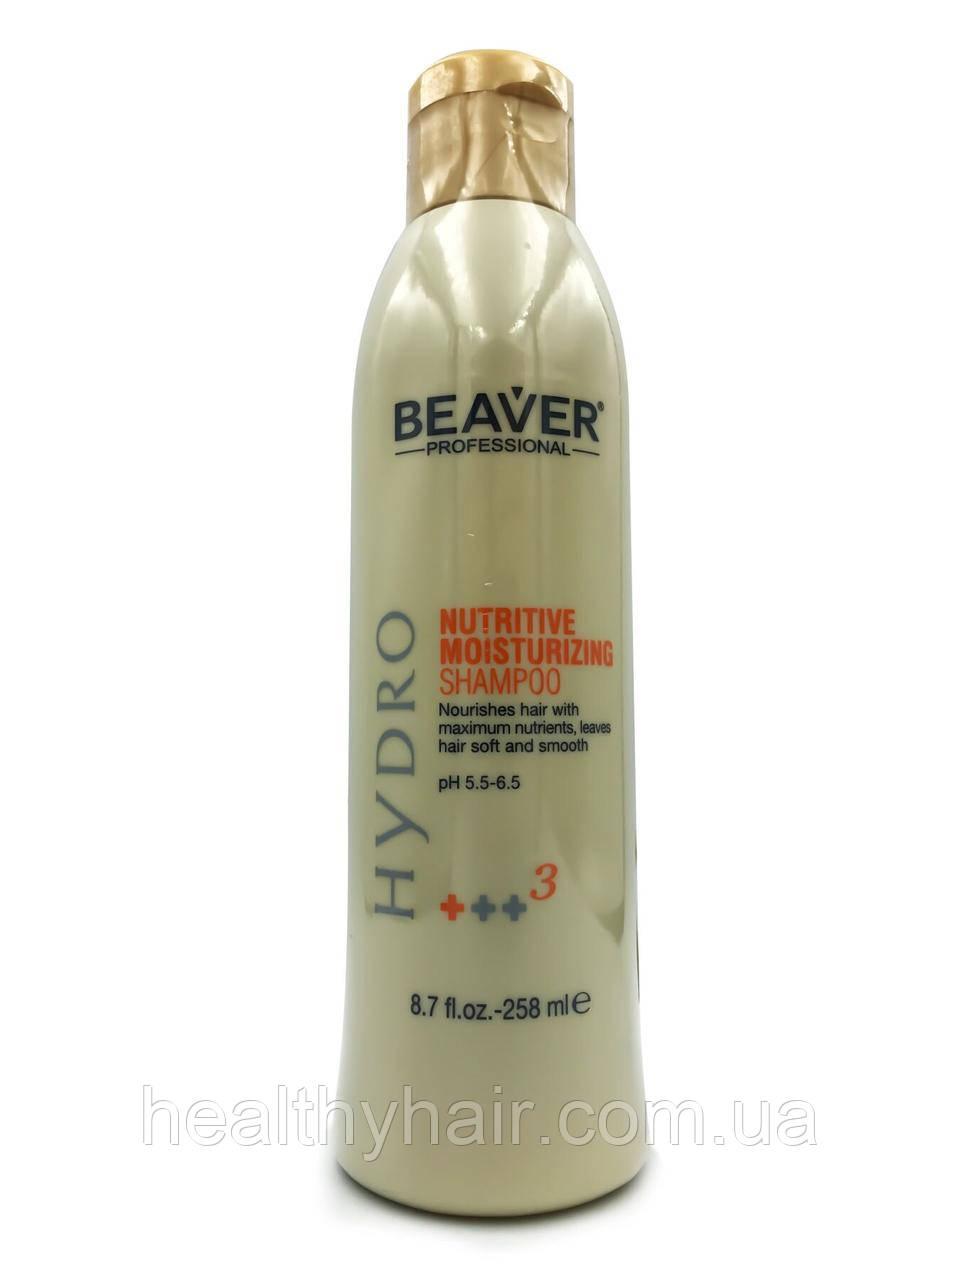 Beaver Hydro Nutritive Moisturizing Shampoo Шампунь живильний і зволожуючий 258 мл